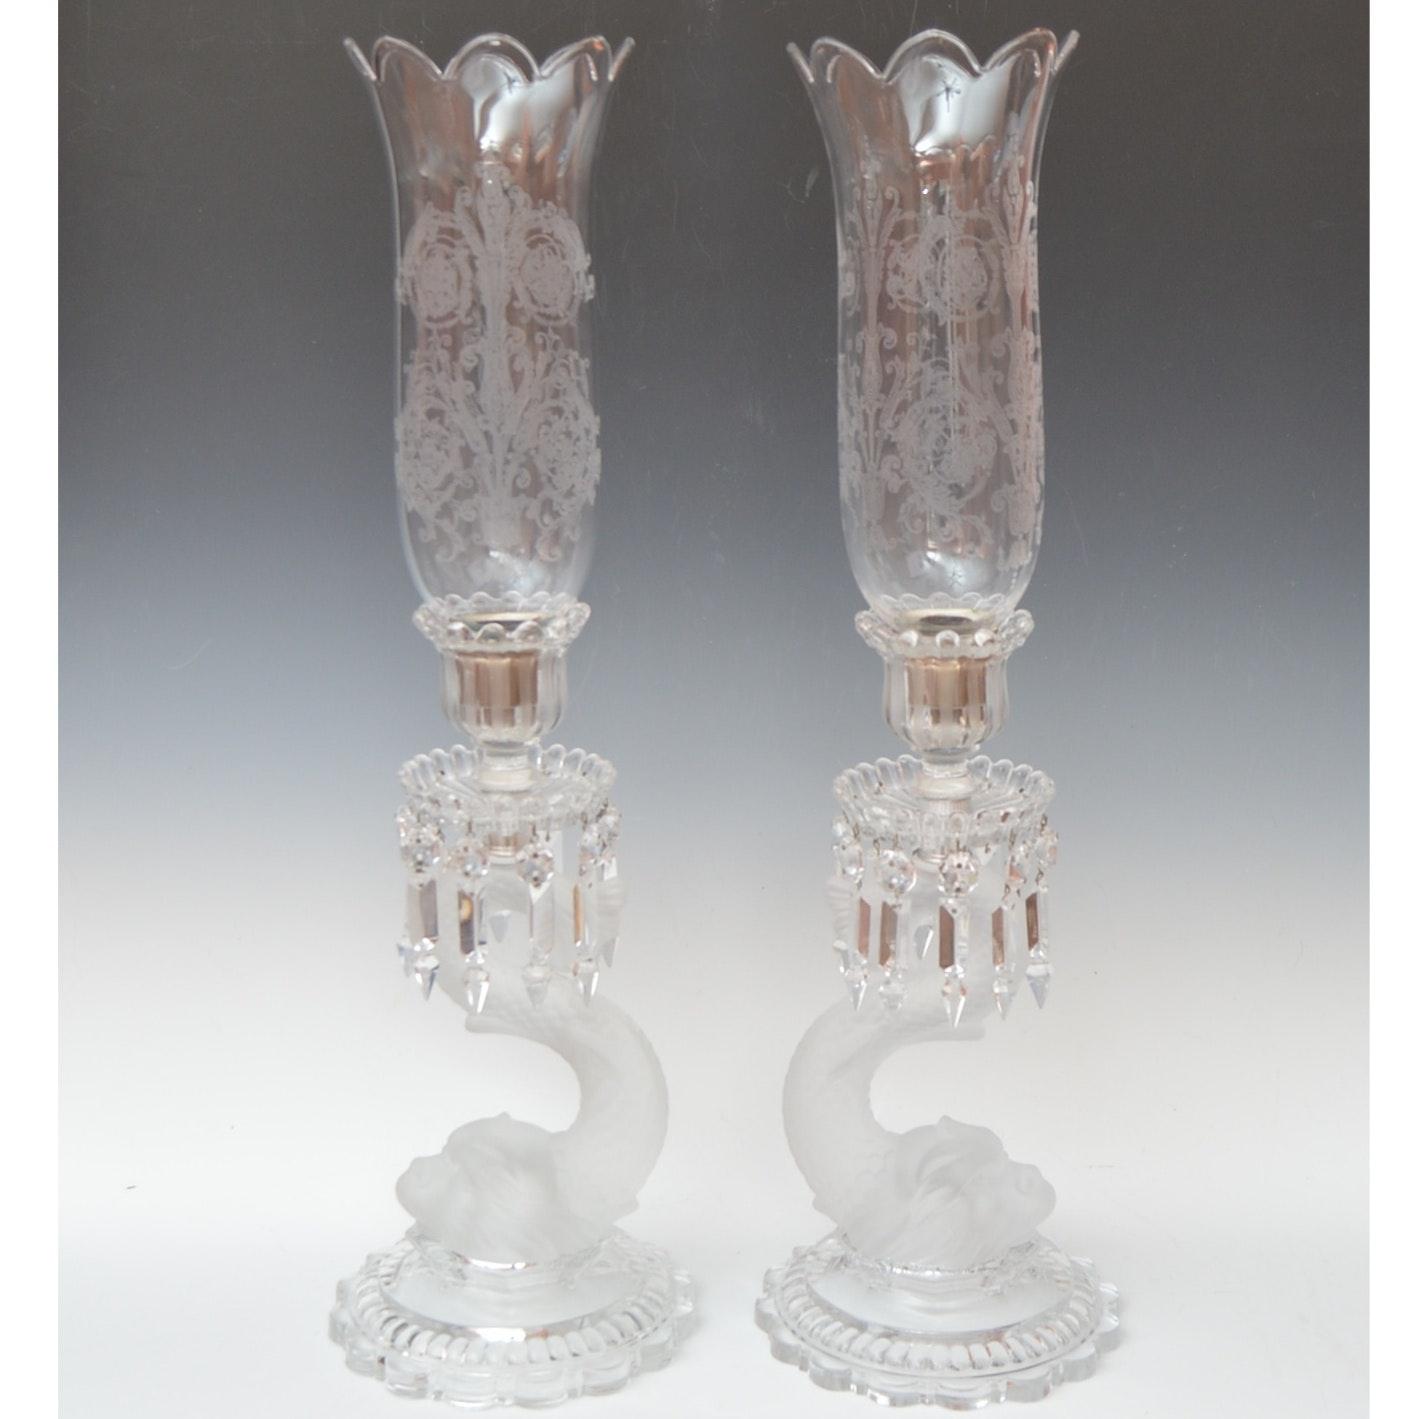 Baccarat Tige Dauphin Crystal Tealight Candleholders